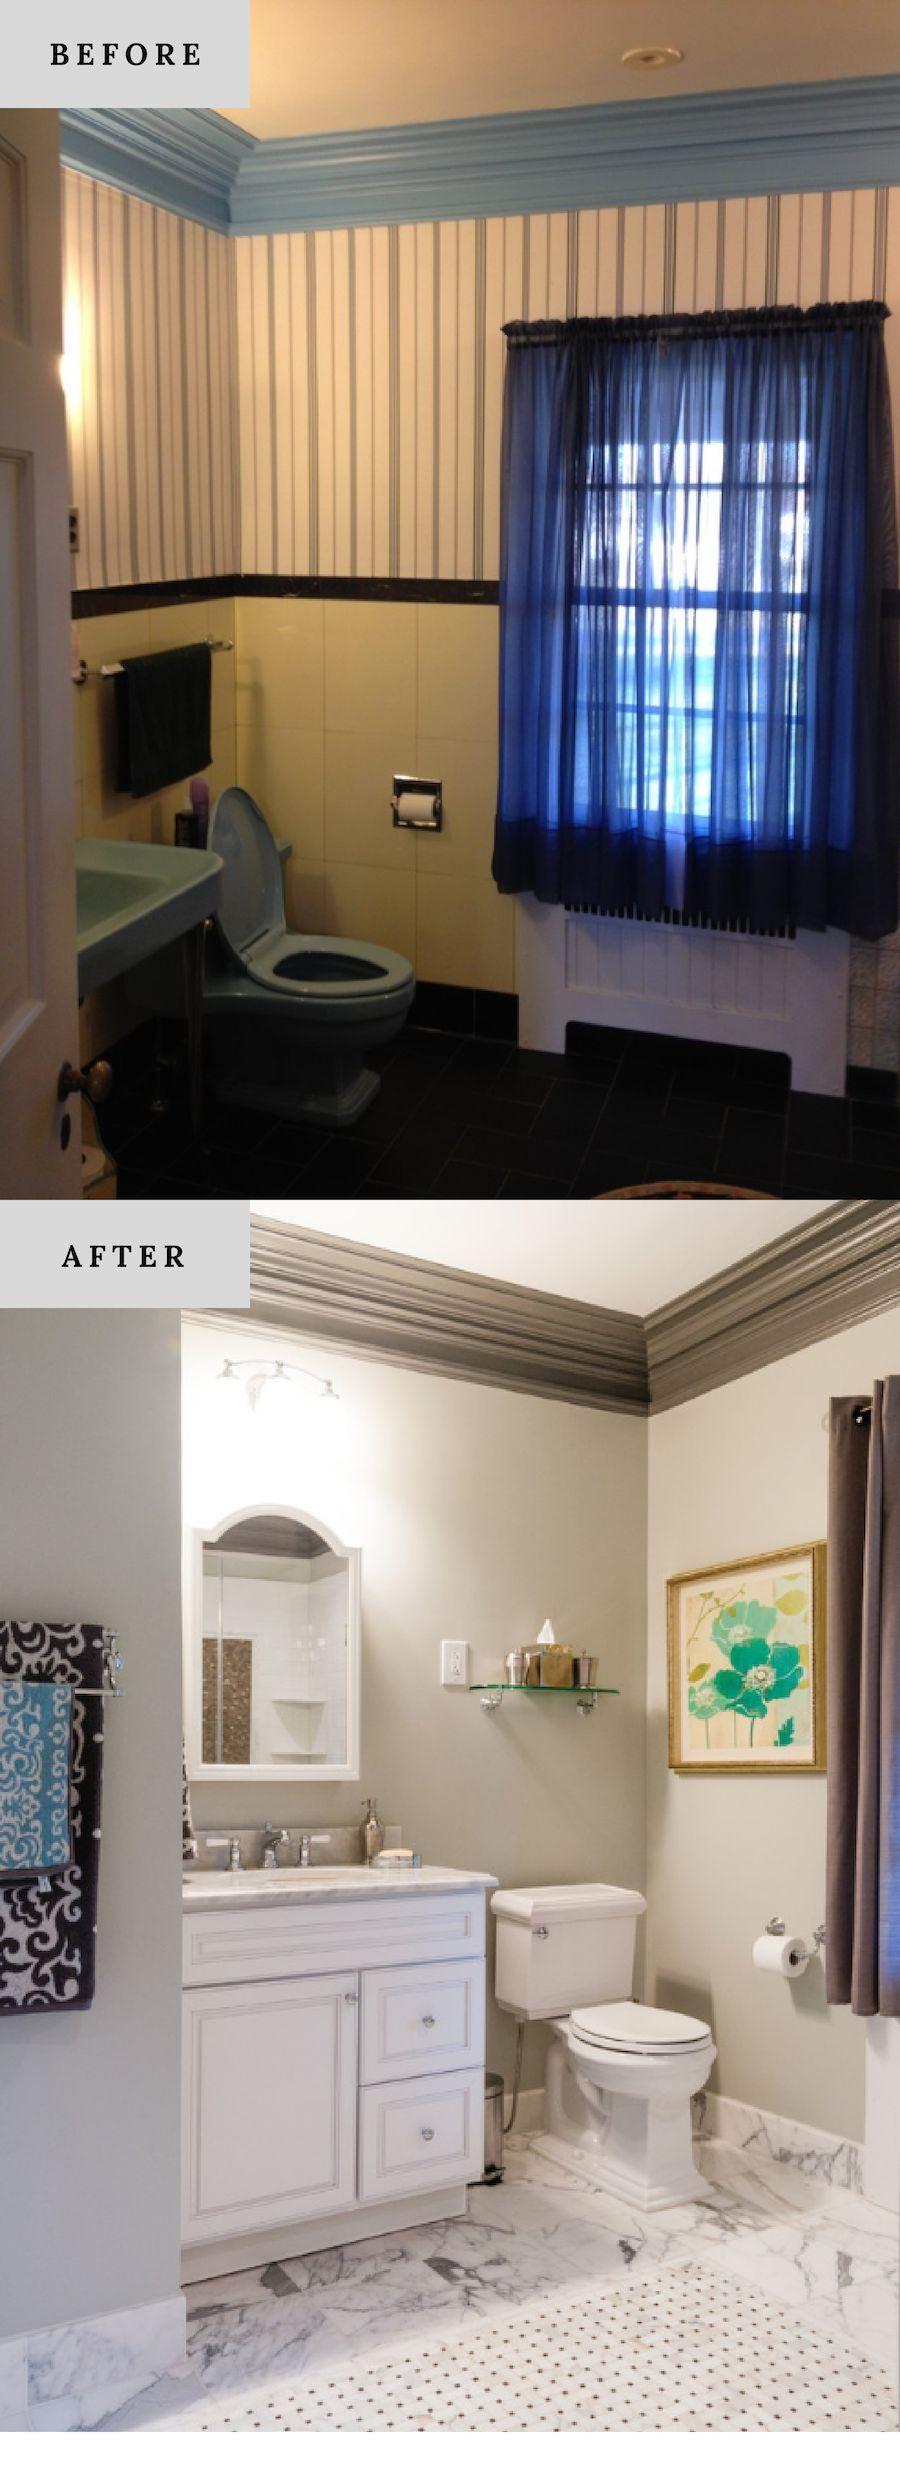 master bath remodel cost